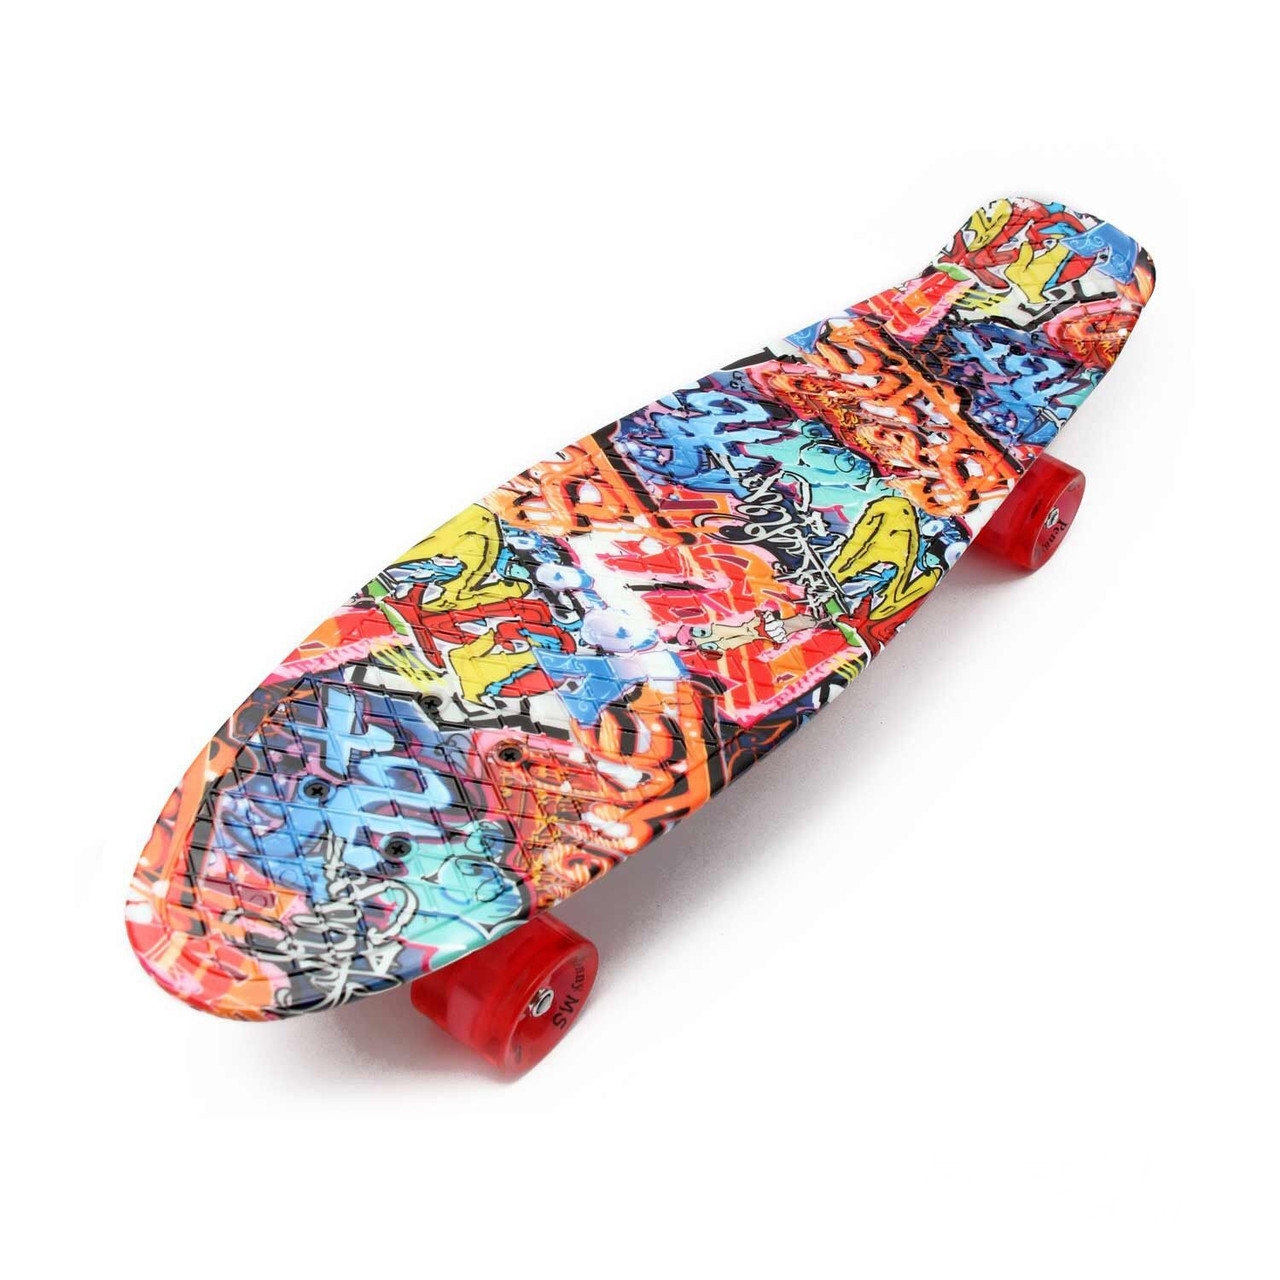 "Скейт Пенни борд Penny Board Nickel Print 27"" - Граффити 68 см пенни борд скейт никель"